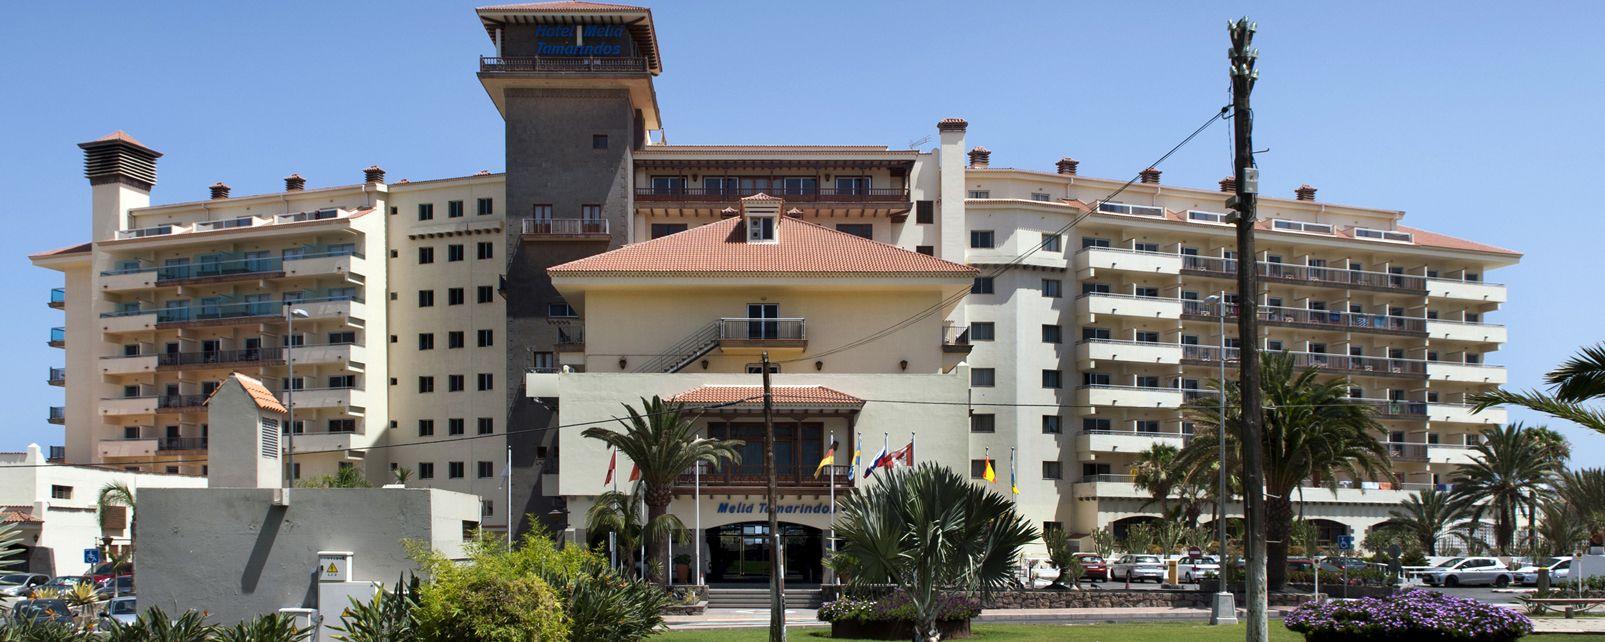 Hôtel Melía Tamarindos